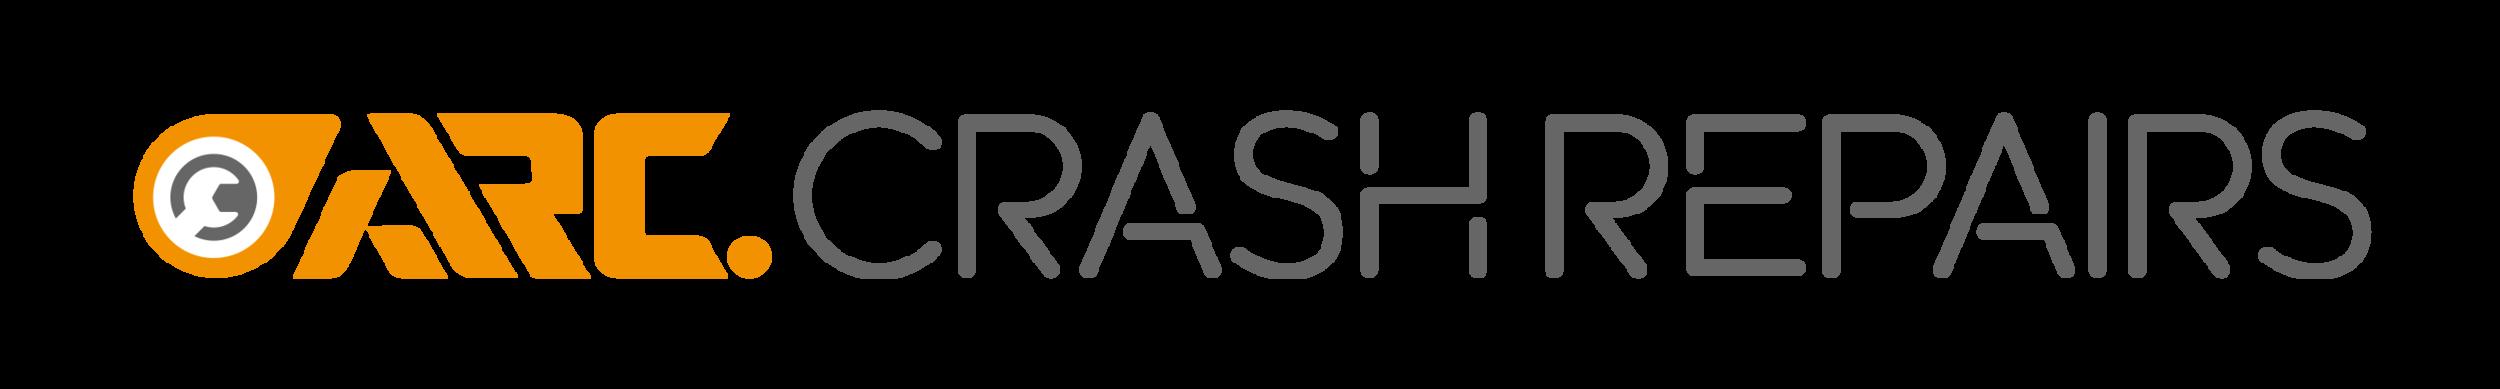 ARC CRASH REPAIR LOGO LS RGB.png